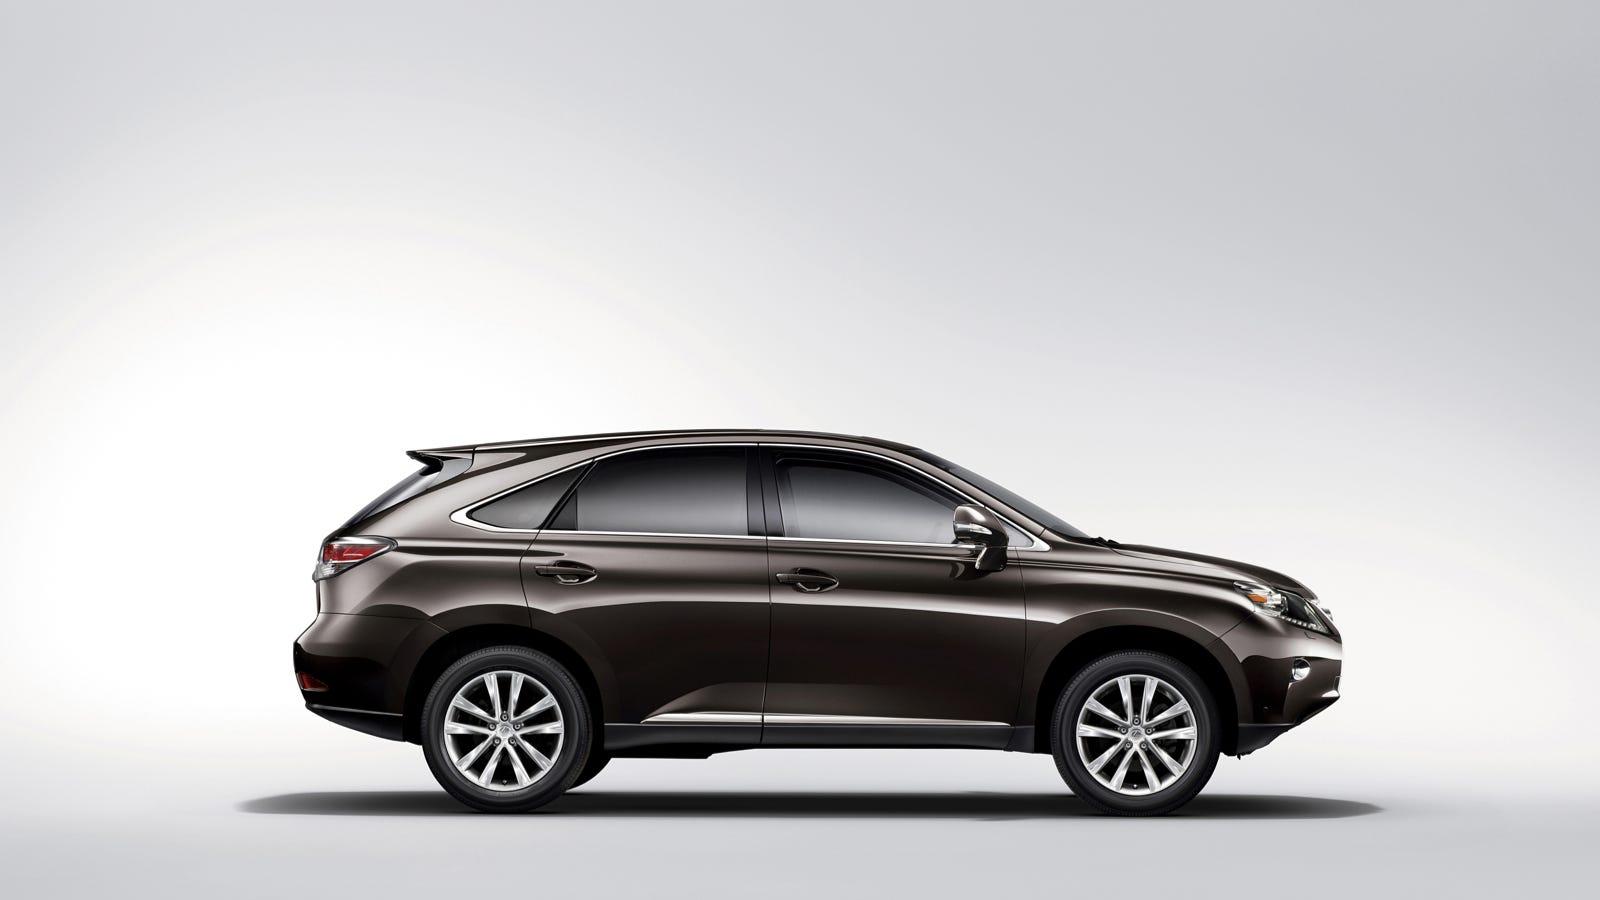 2014 Lexus RX 350 Demonstrates How Lexus Created Then